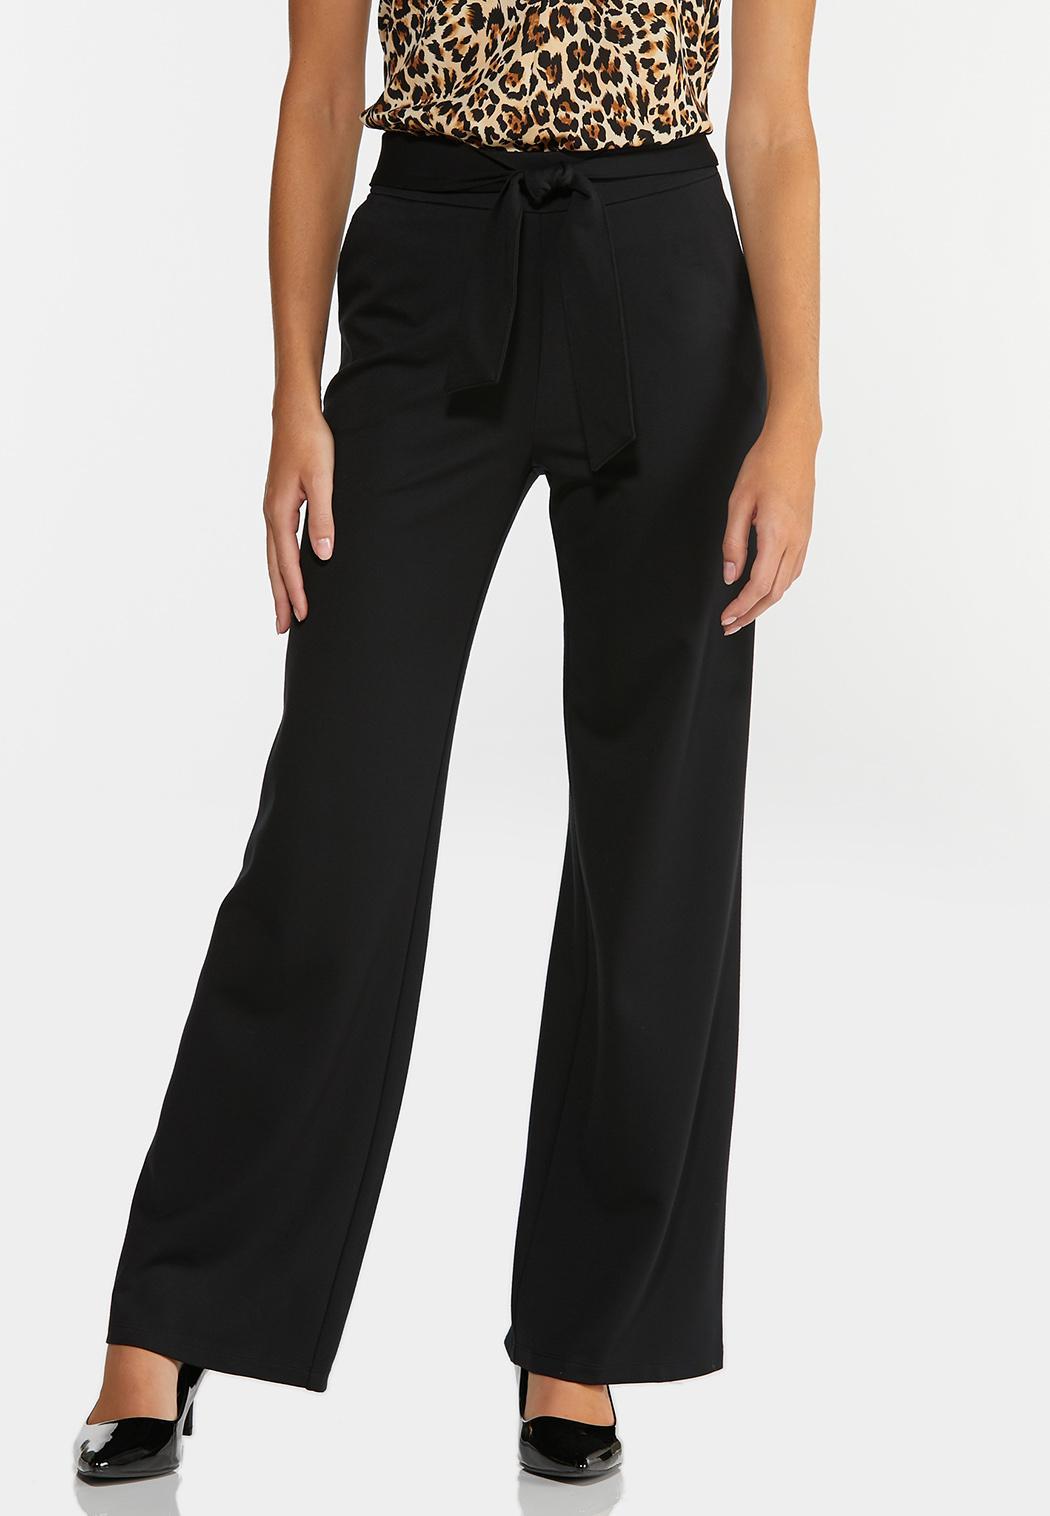 Petite Ponte Tie Waist Pants